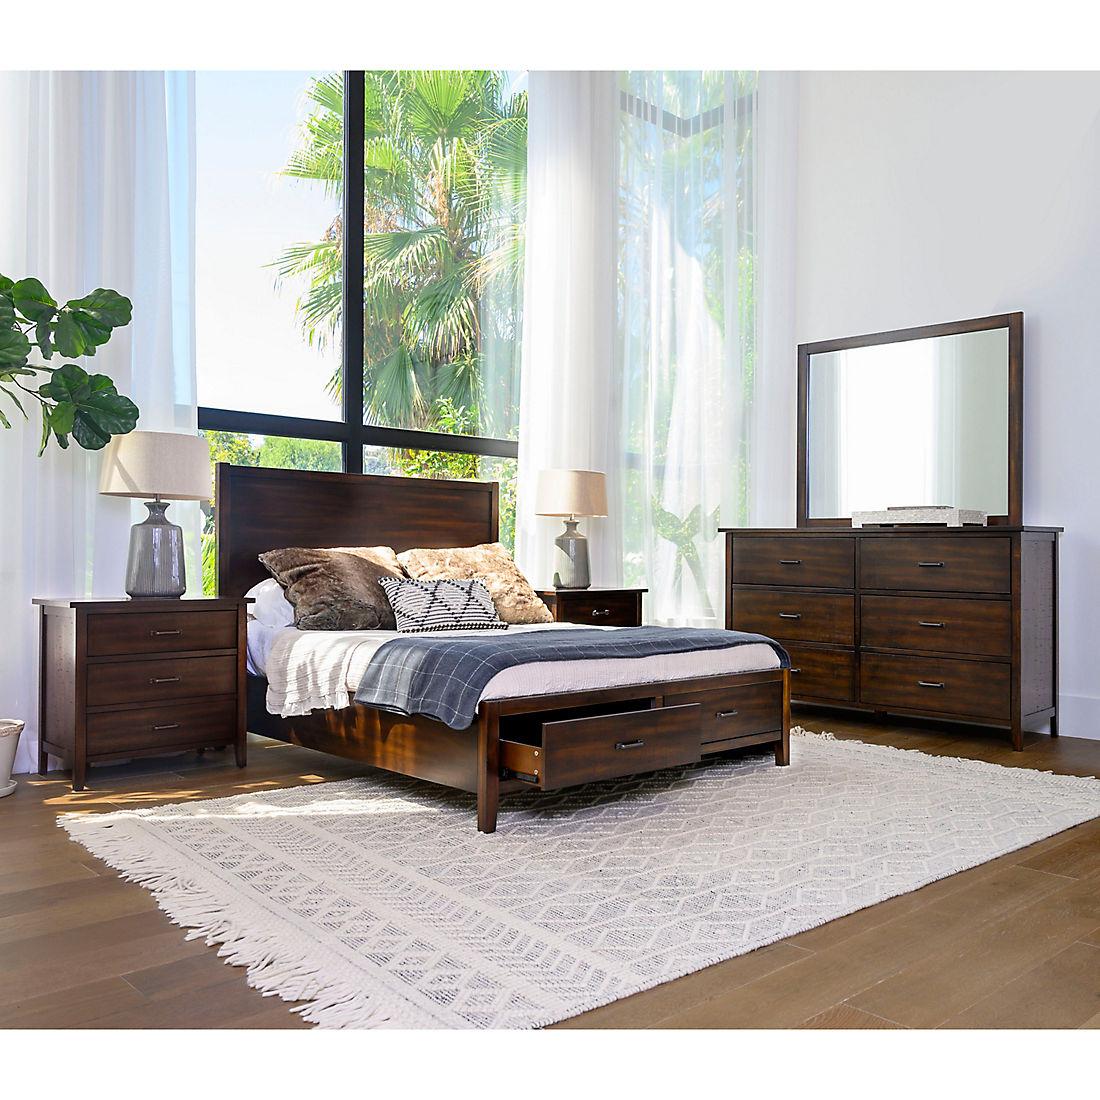 Abbyson Living Lakewood 5-Pc. Bedroom Set - Queen